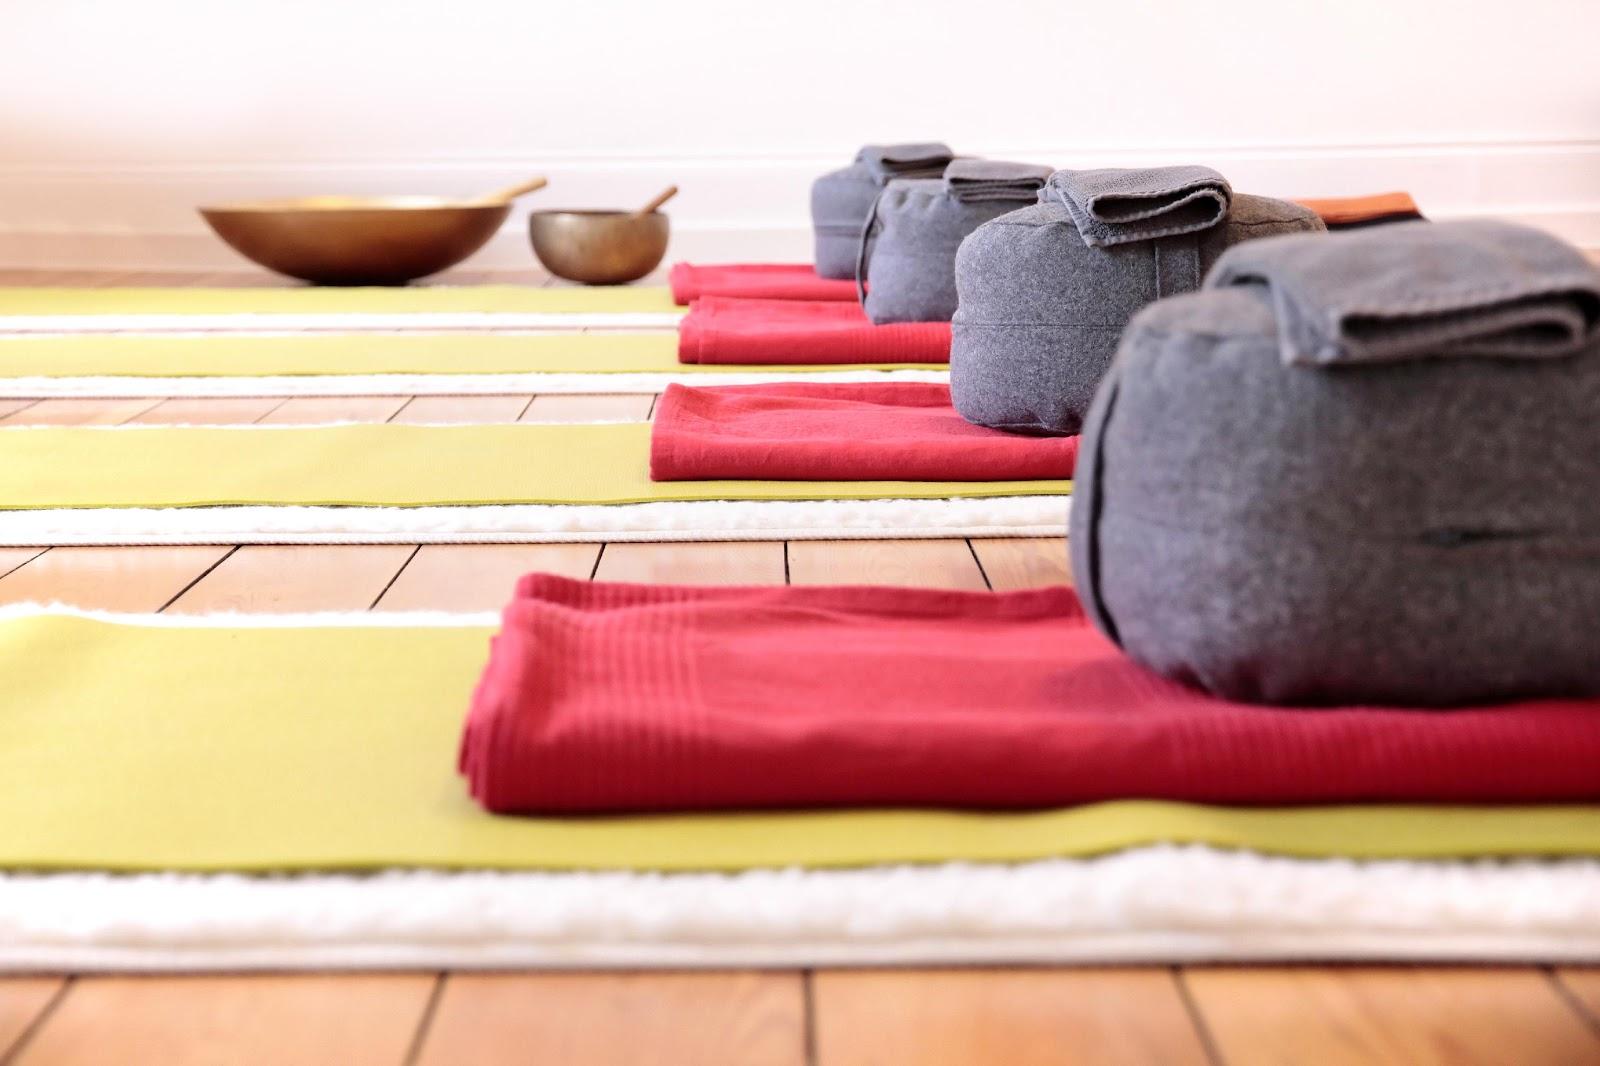 Perfect Poise Pilates  | GoSweat | The 6 Best Streatham Yoga and Streatham Pilates